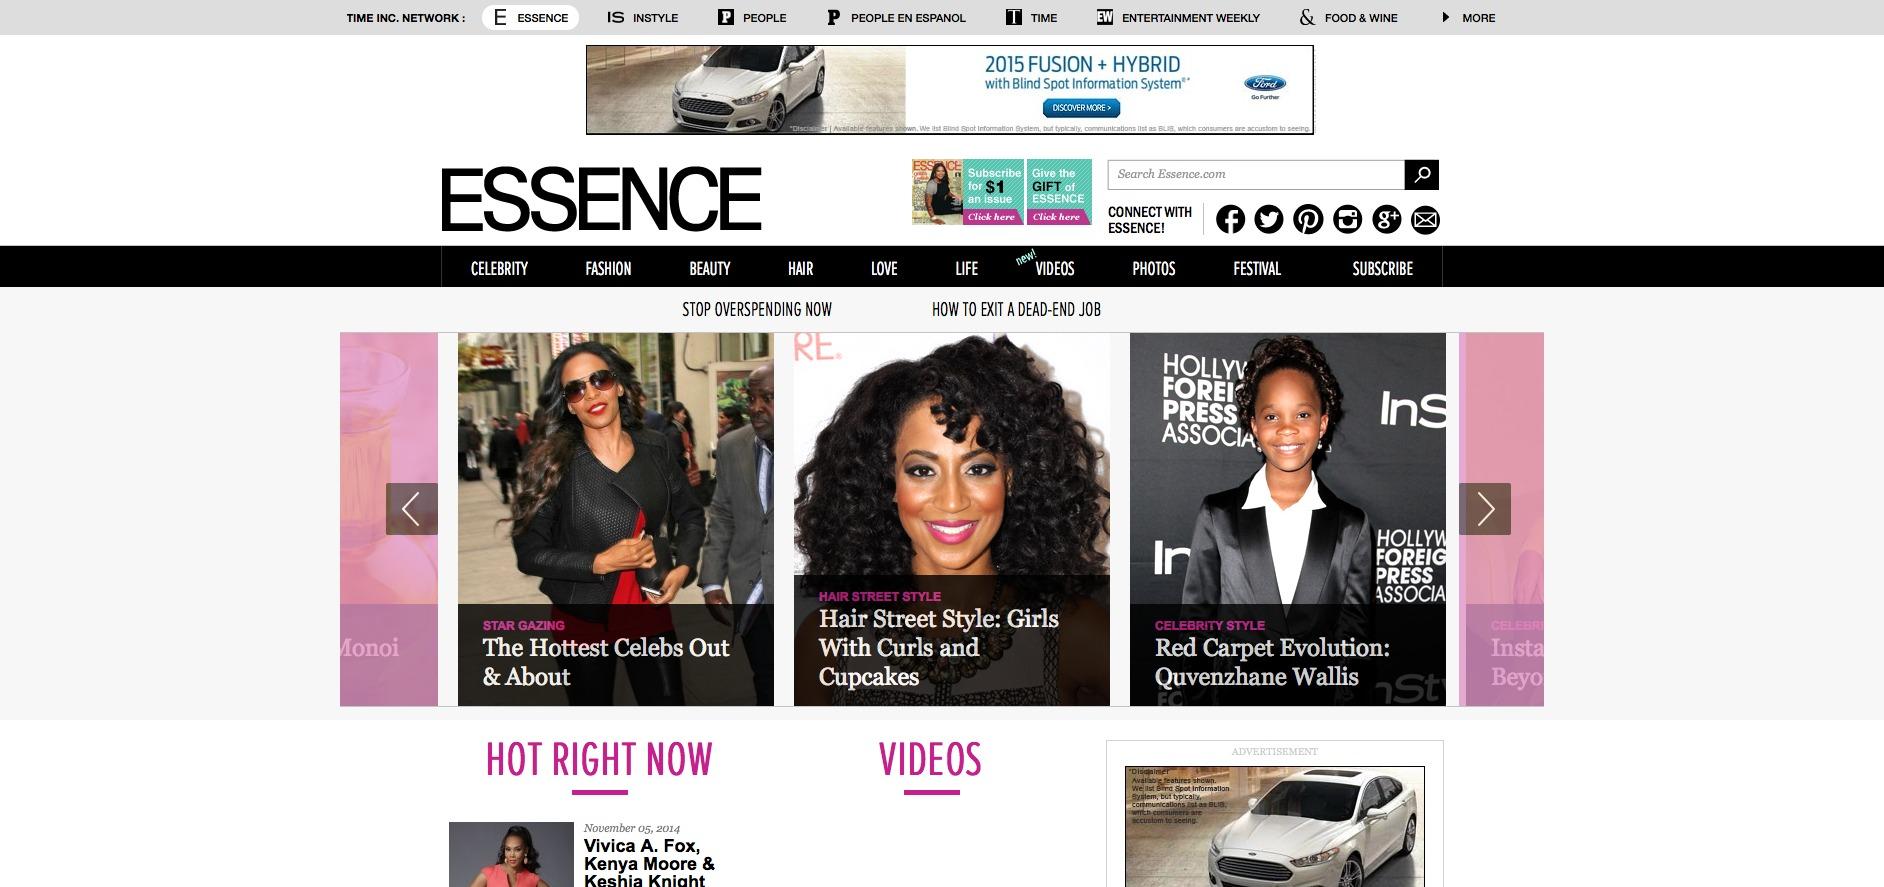 Essence_Magazine_Essence.com_-_2014-11-06_08.12.00